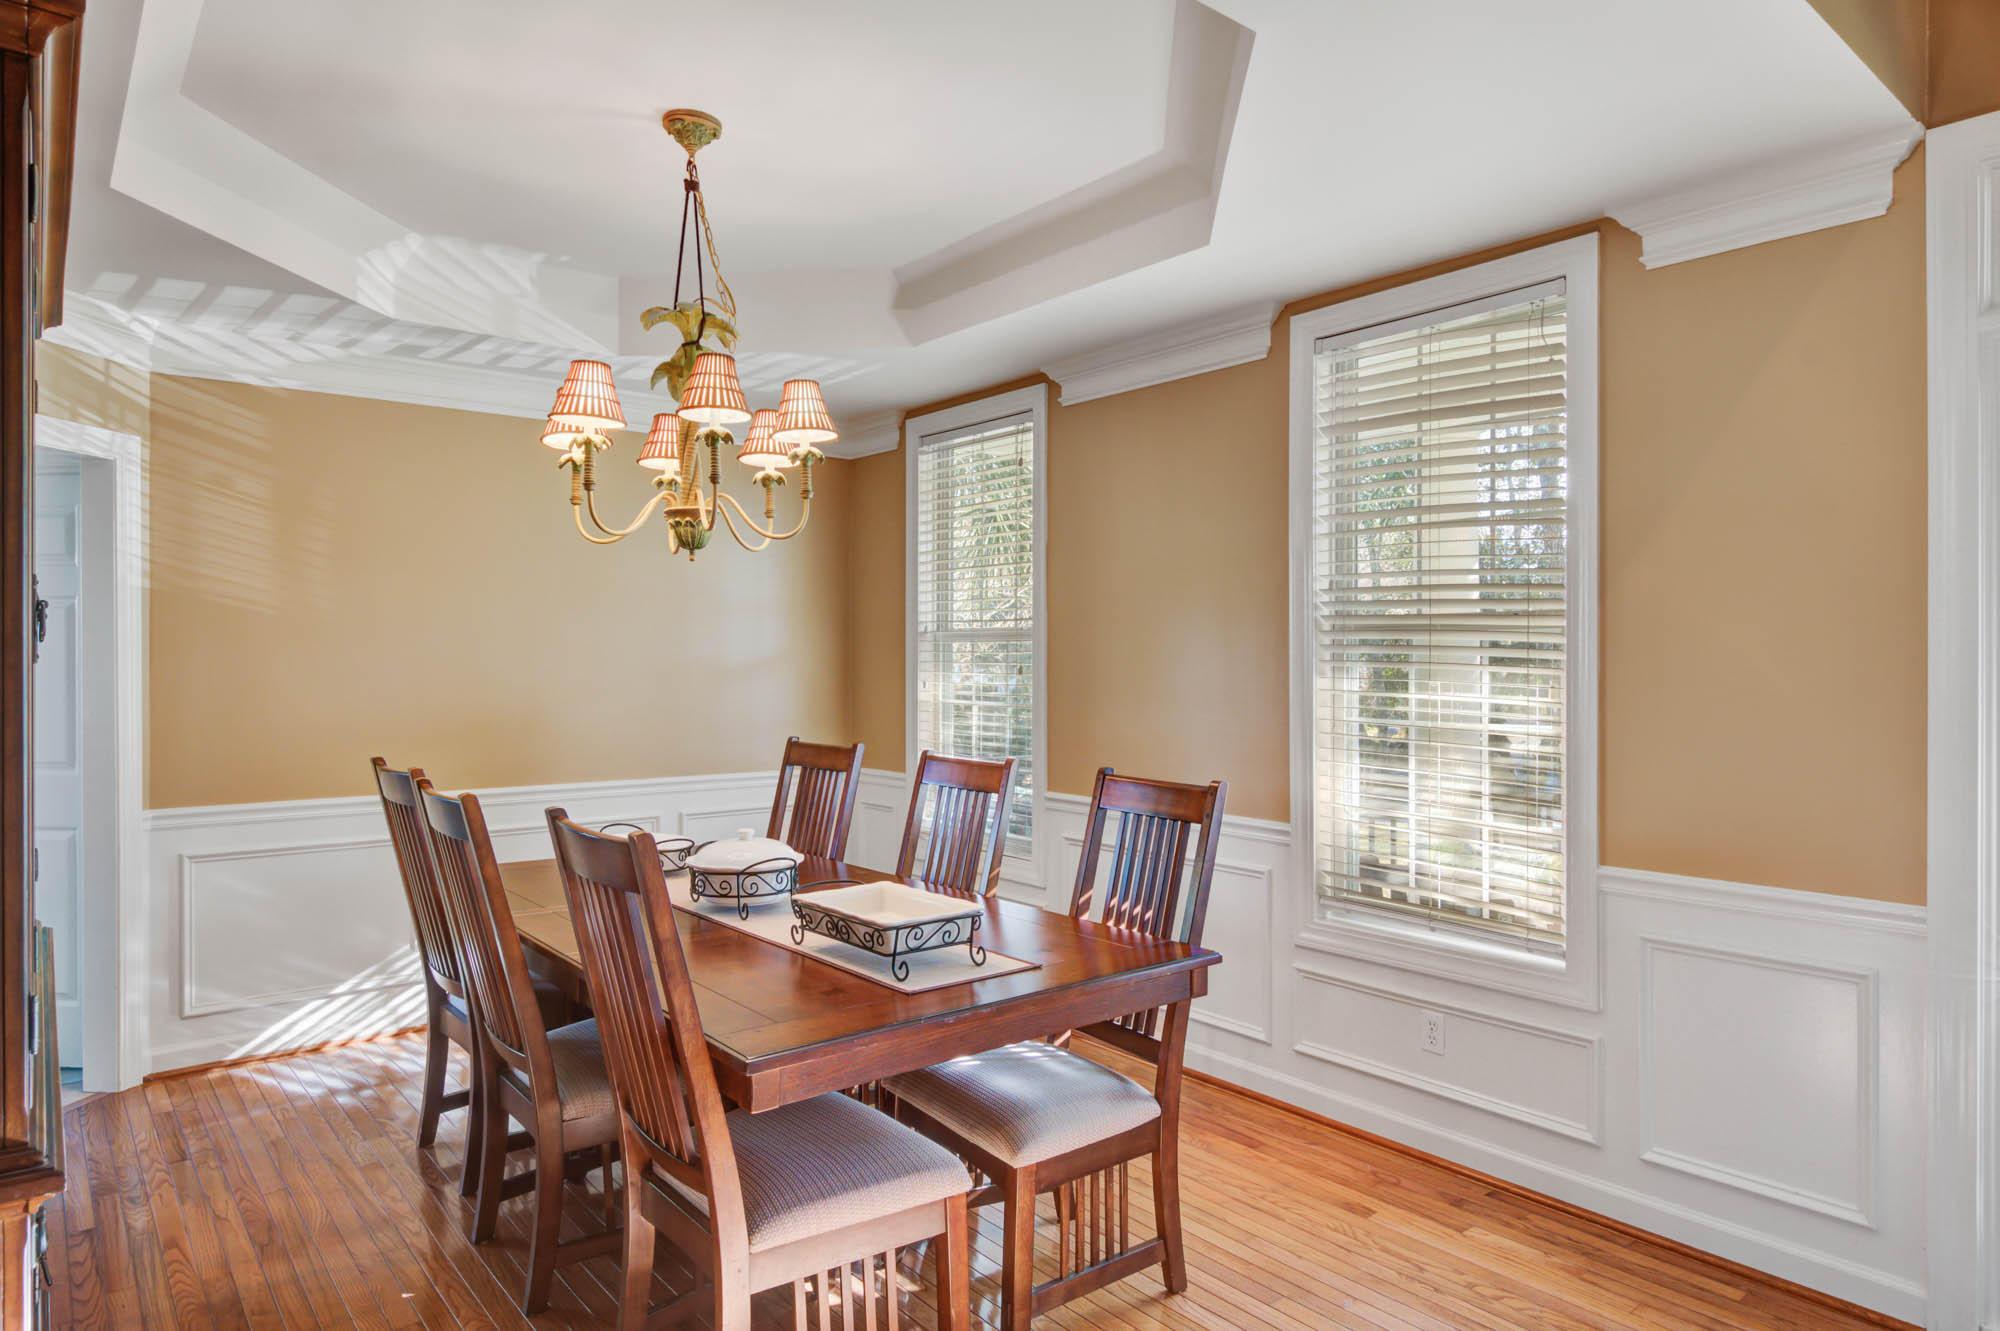 St Thomas Point Homes For Sale - 307 Jamesbury, Charleston, SC - 40